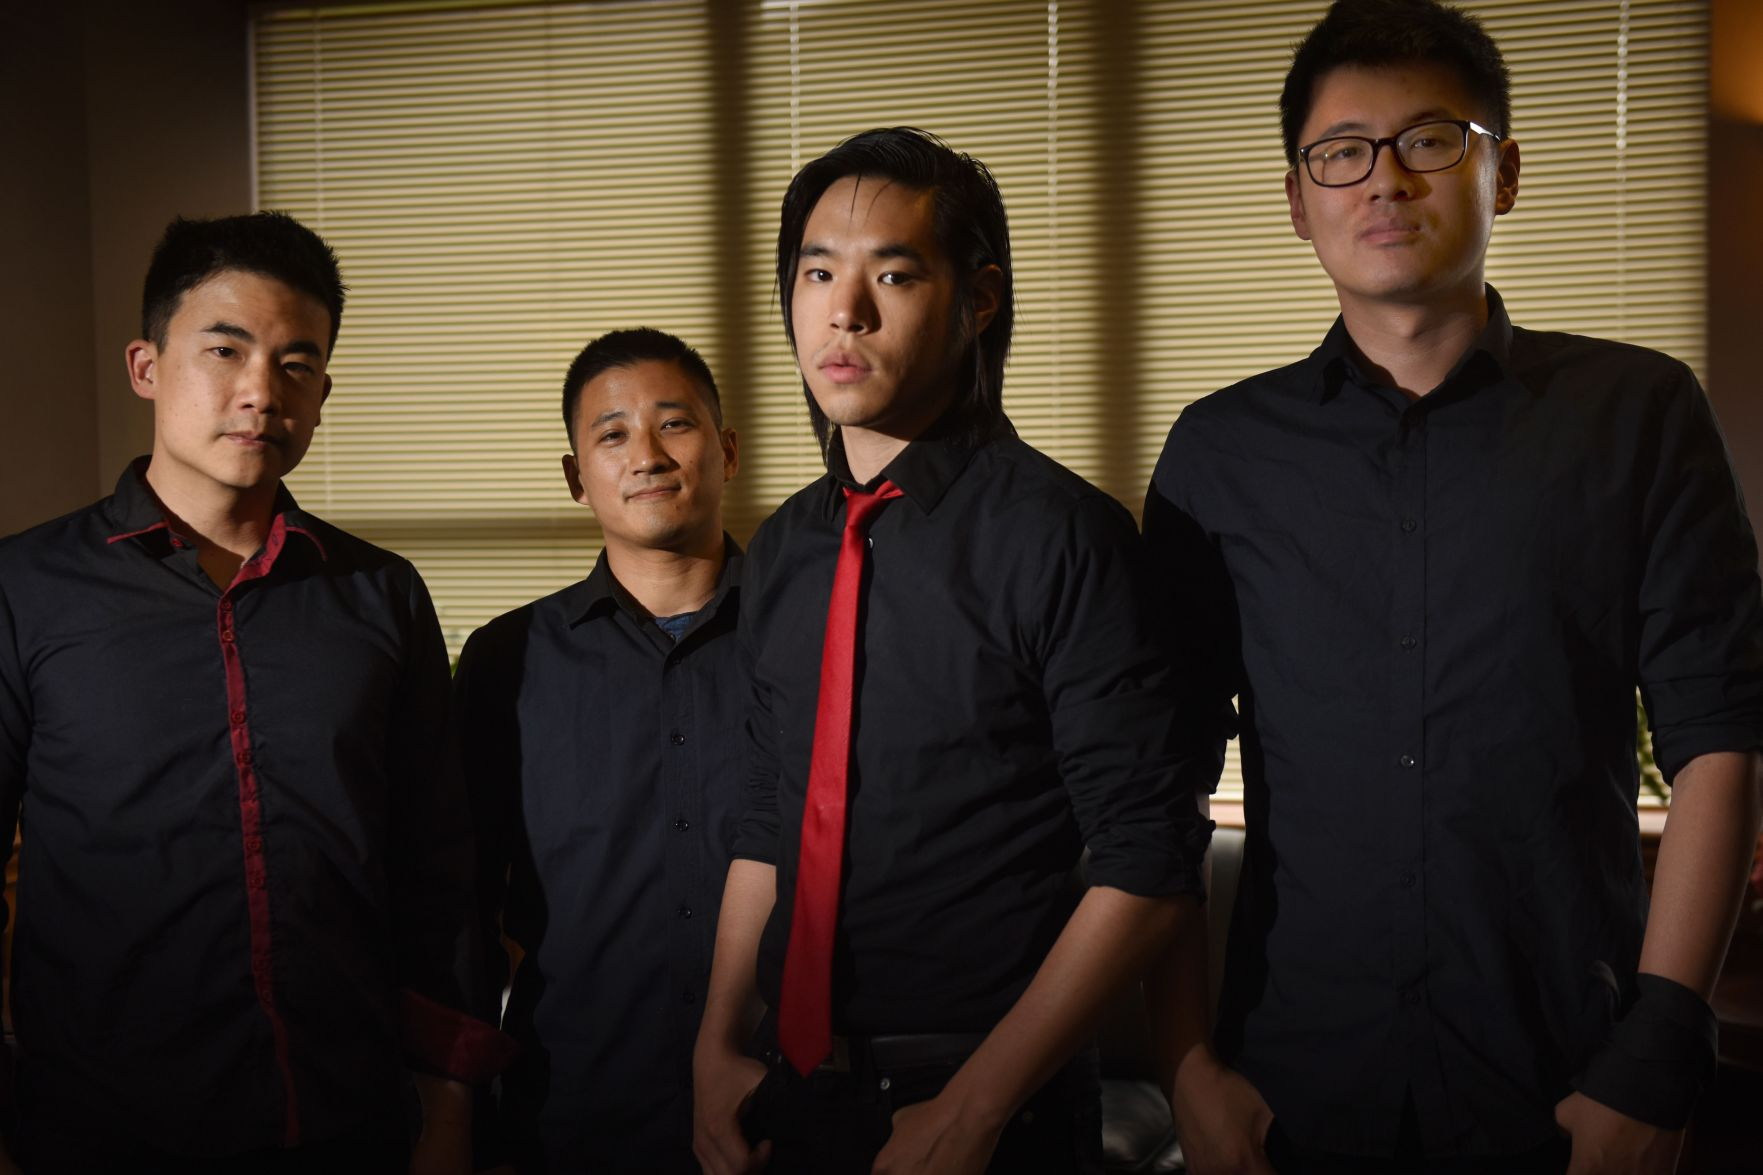 Asian American Band